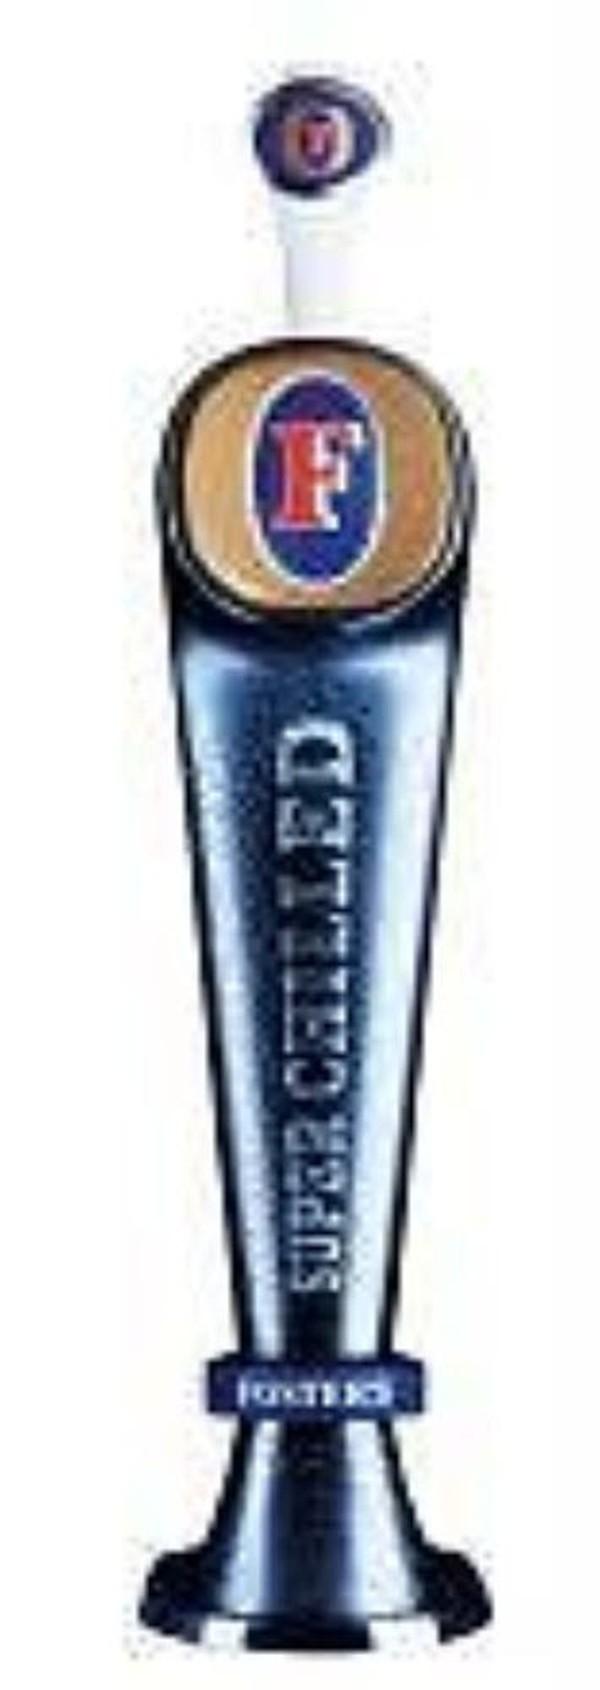 Fosters beer pump